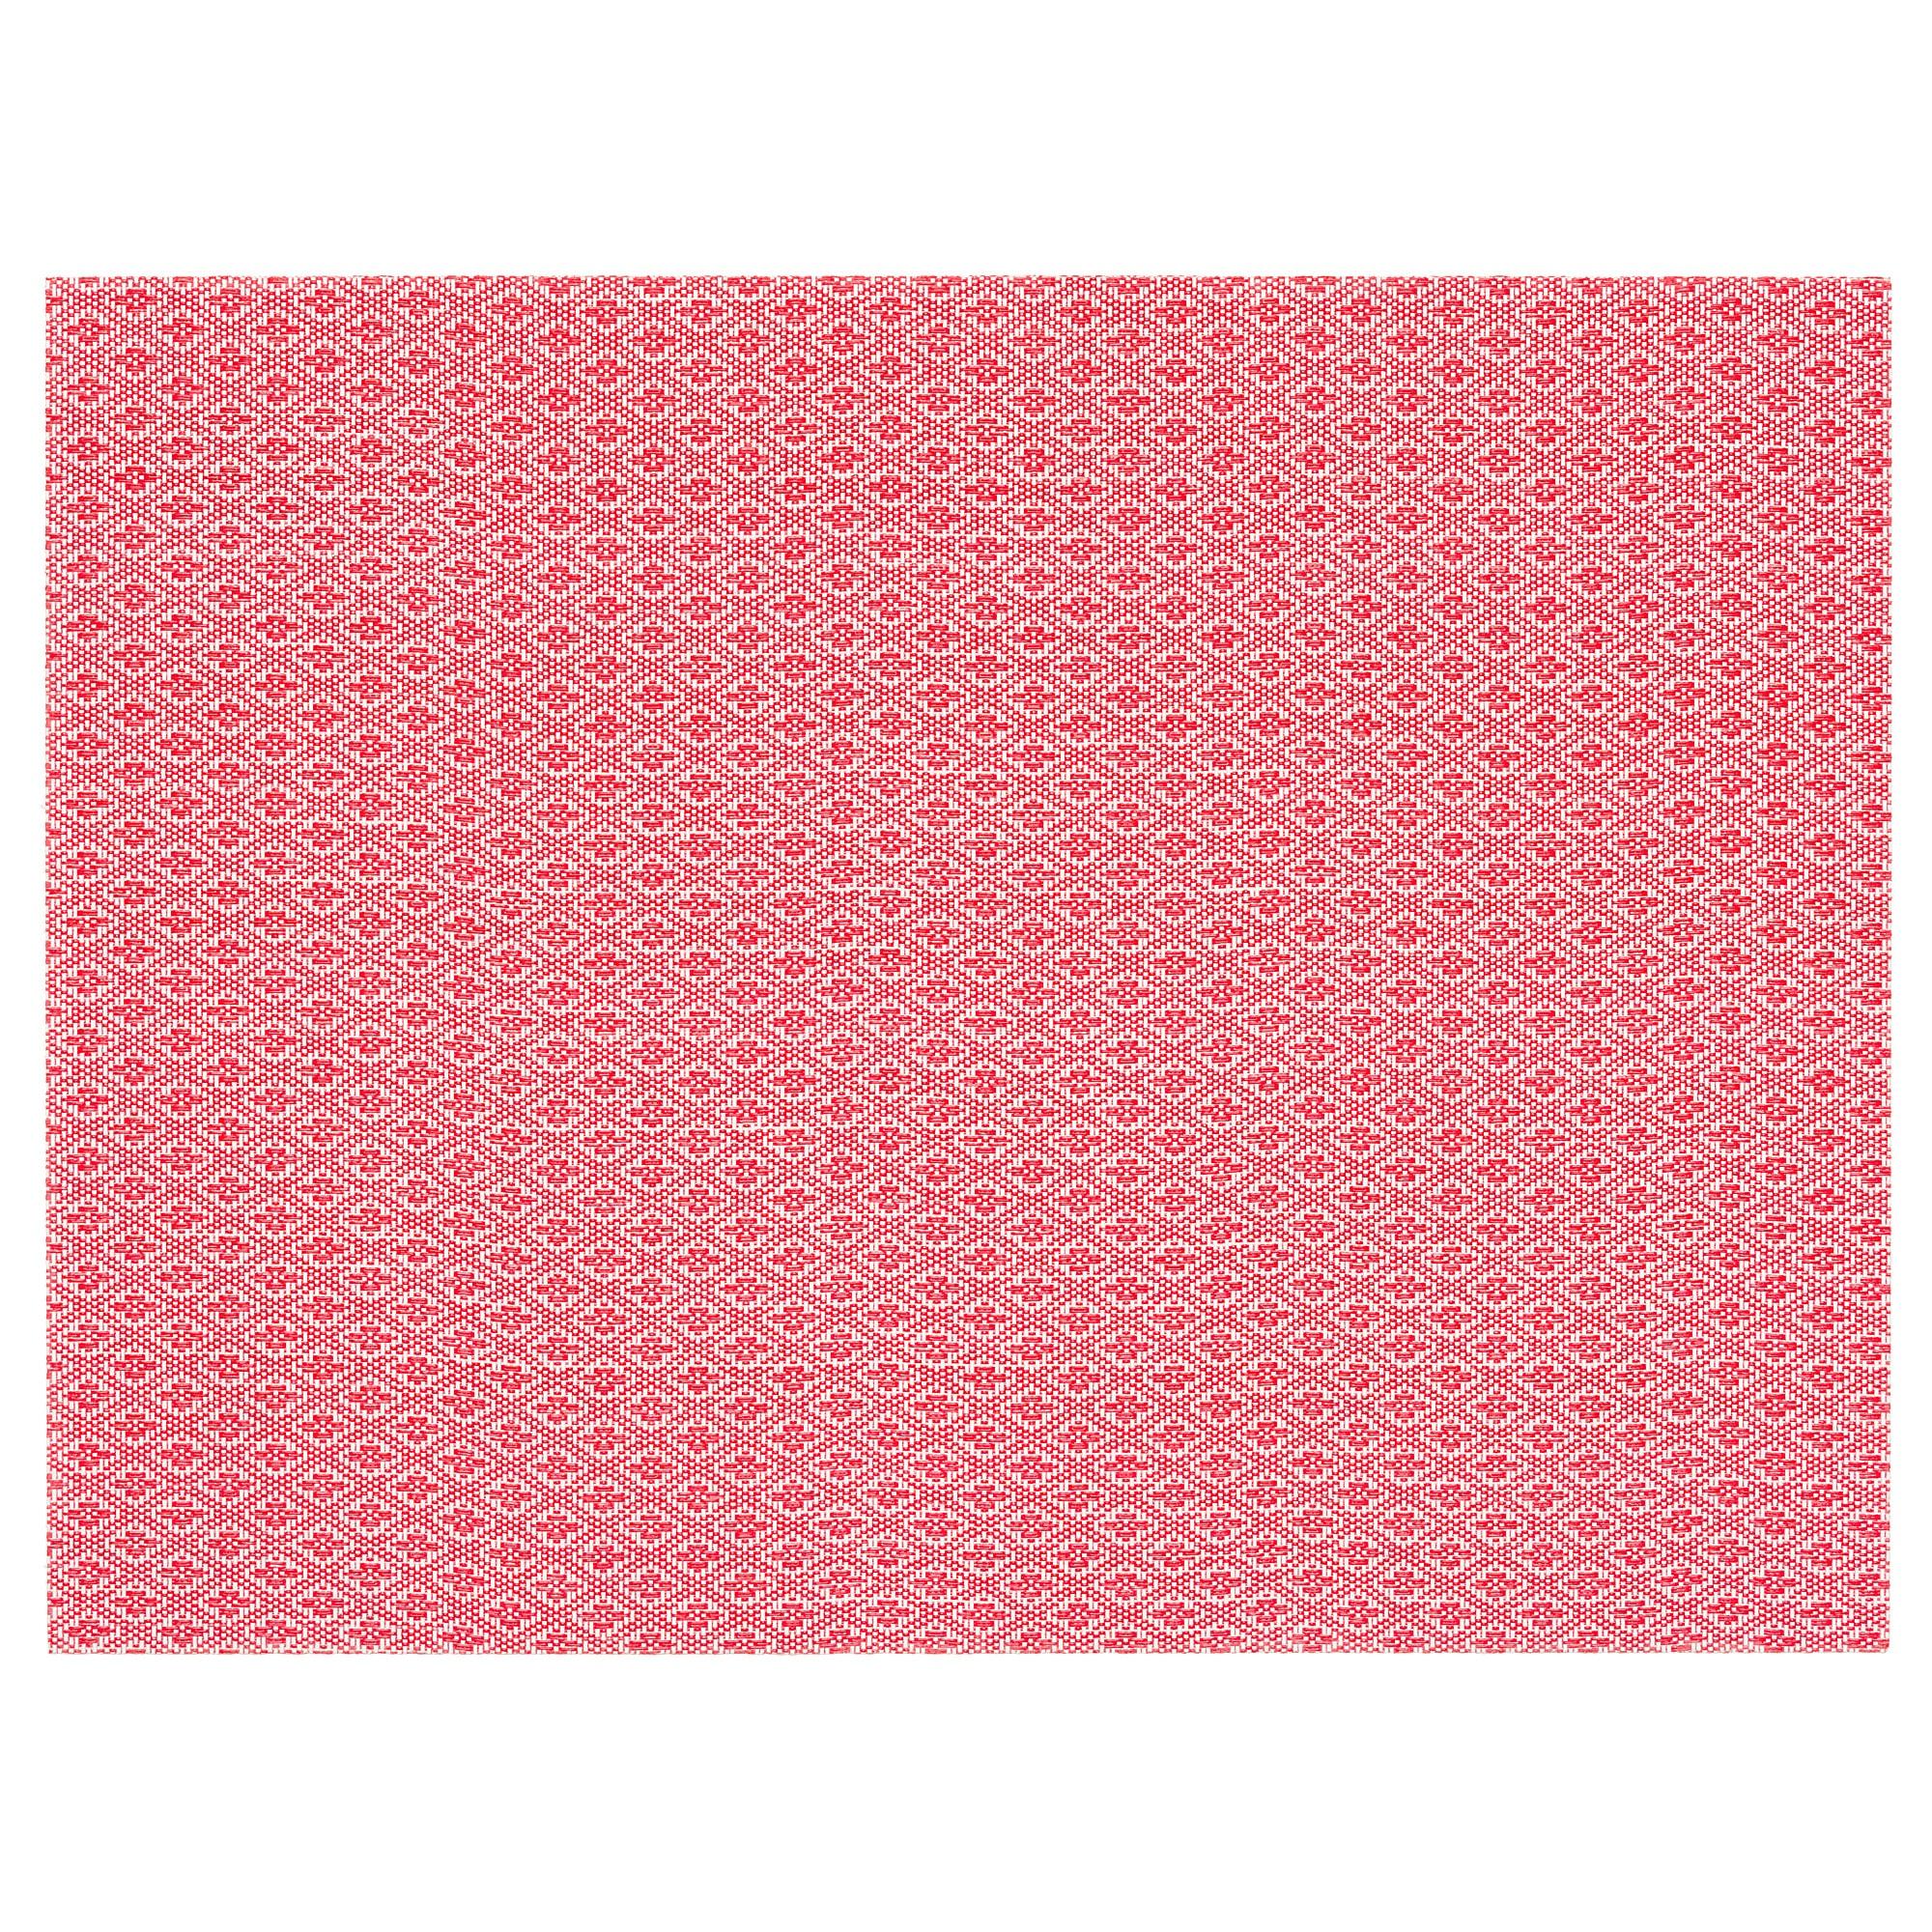 Mantel Individual Dddy Gallra Mantel Individual Rojo Con Diseà O 45 X 33 Cm Ikea